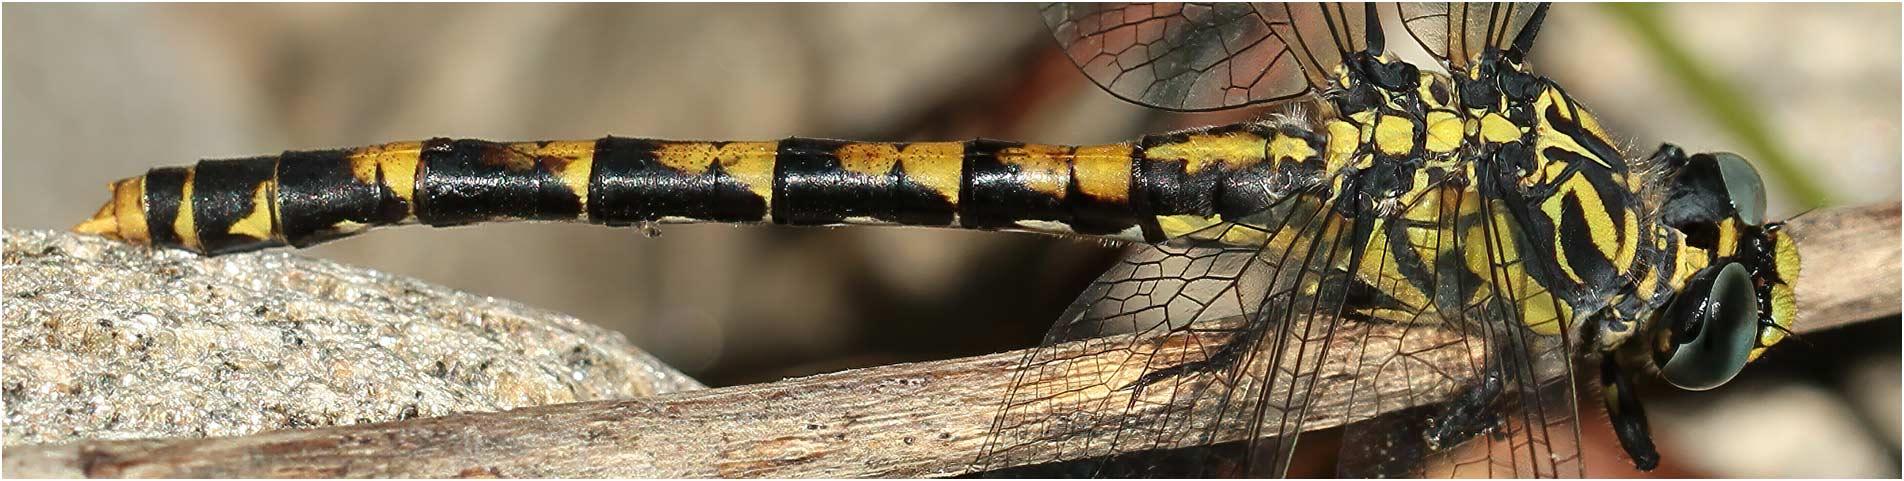 Onychogomphus uncatus femelle, Malbosc (France-07), 14/07/2014